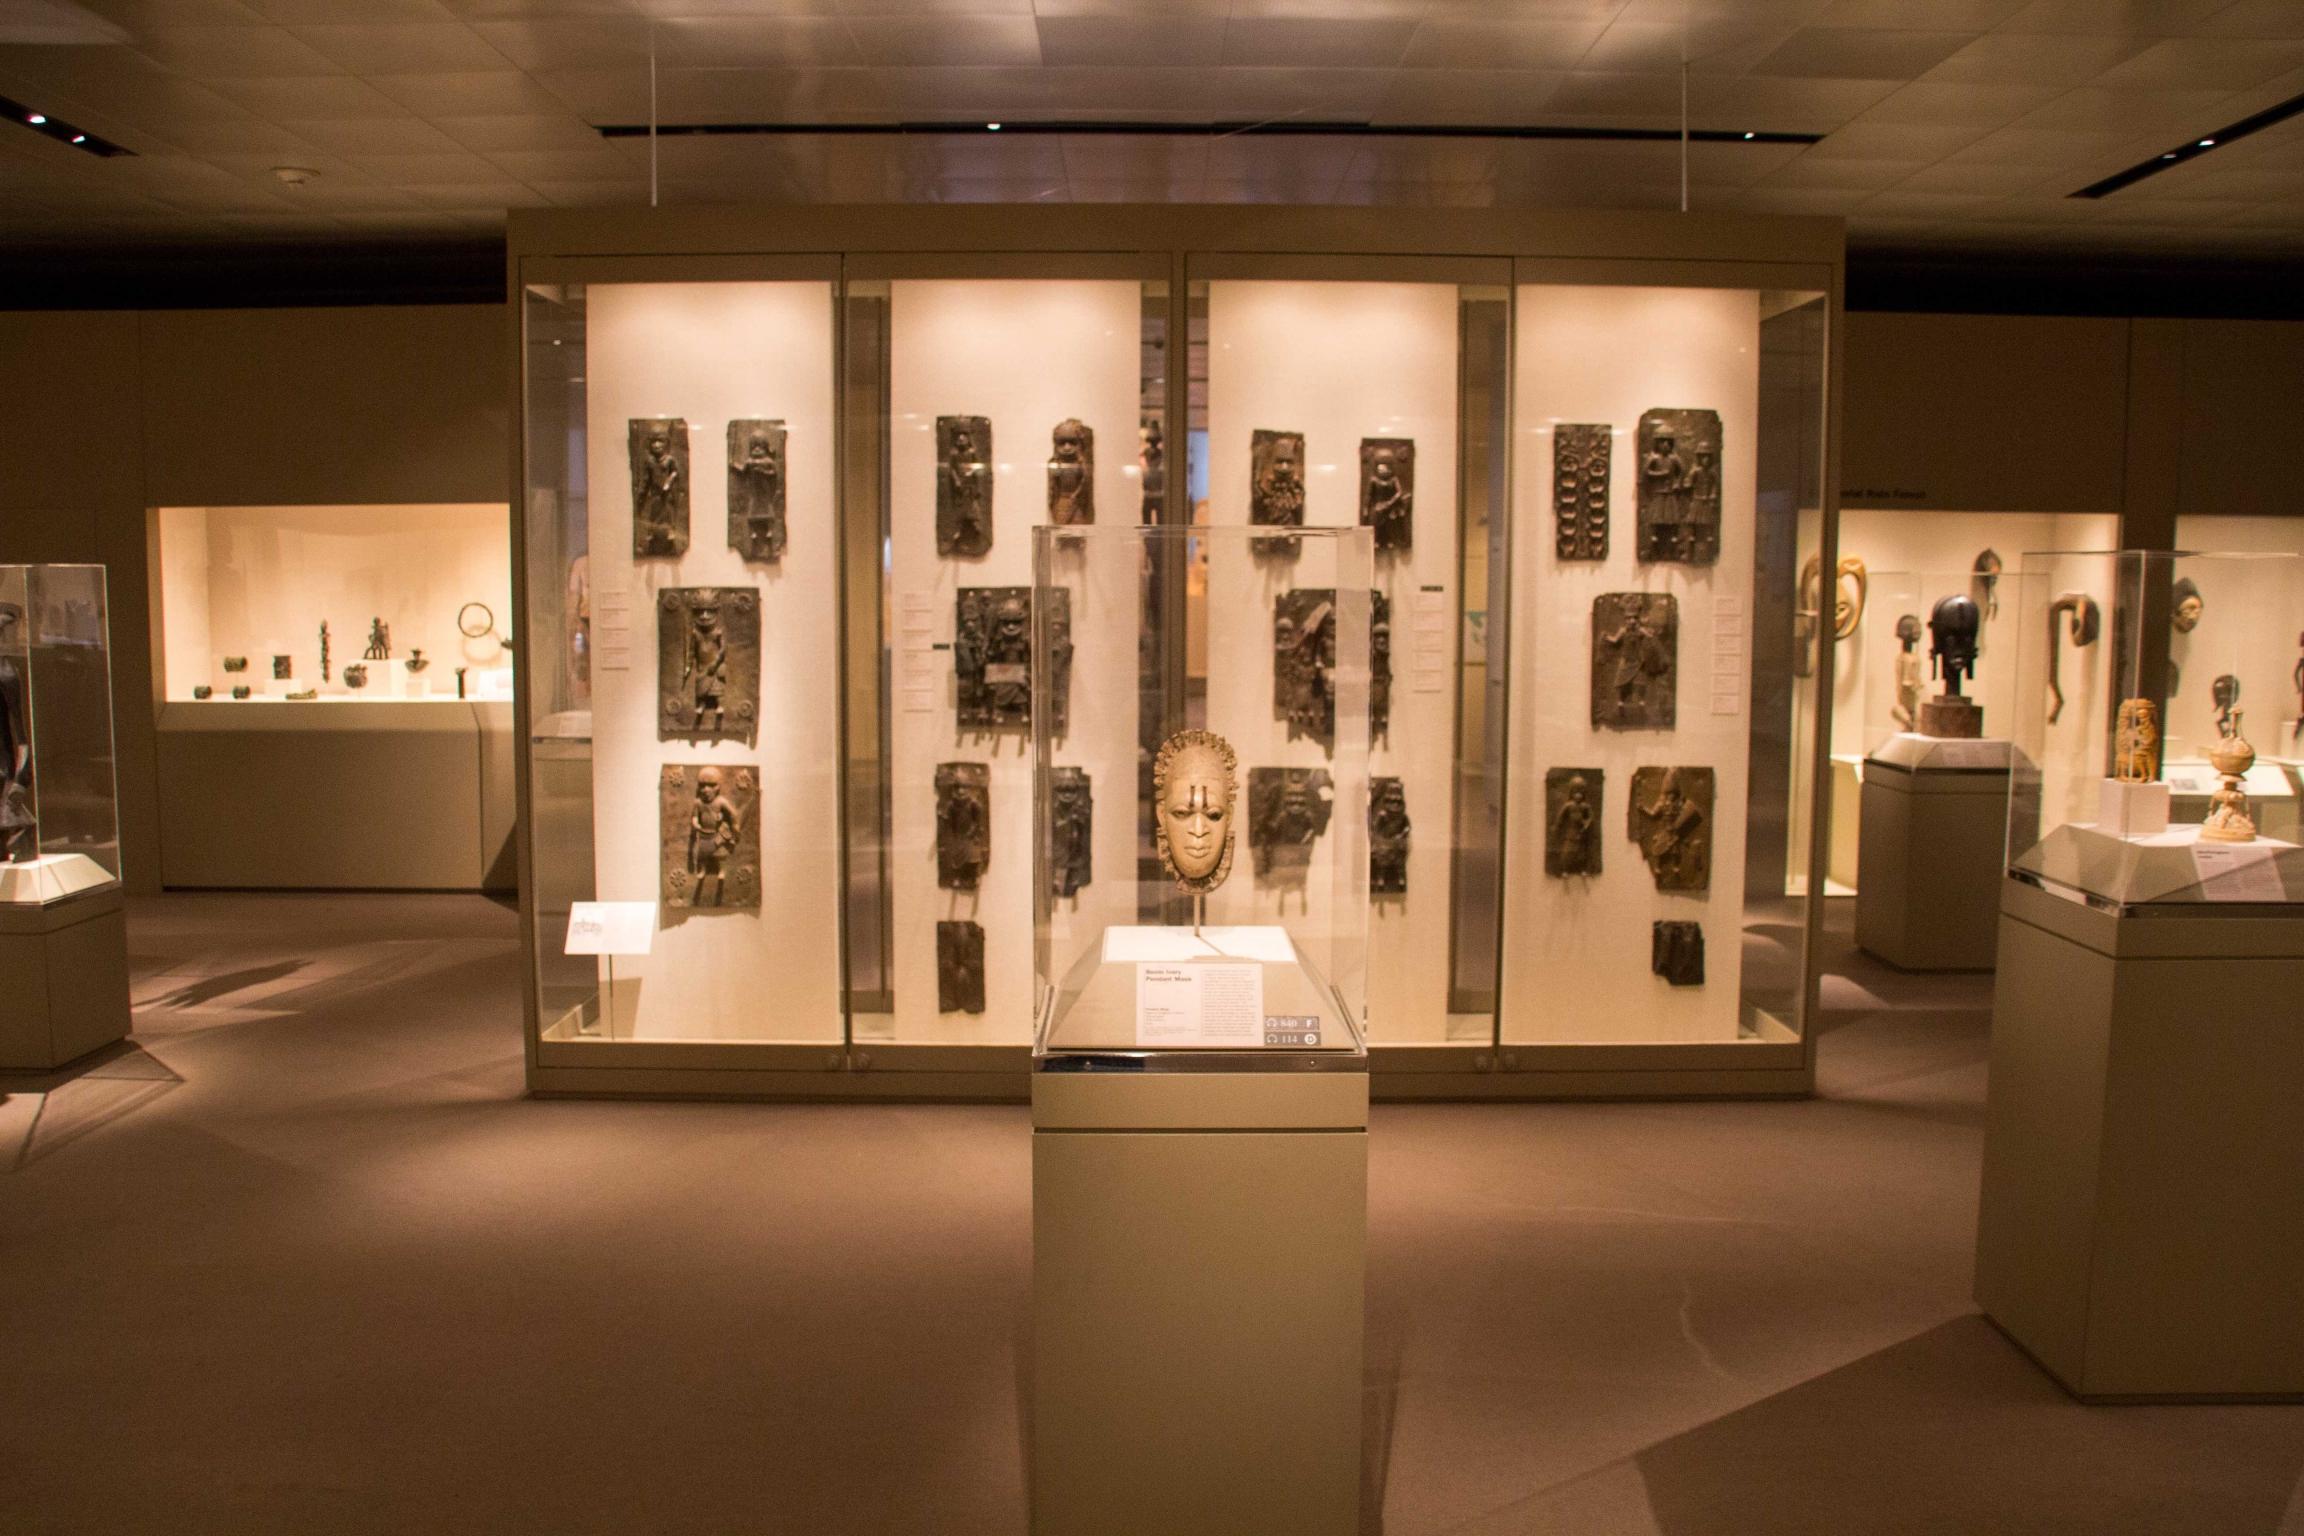 Benin bronzes at theMetropolitan Museum of Art inNew York City. Photo was taken in 2017.